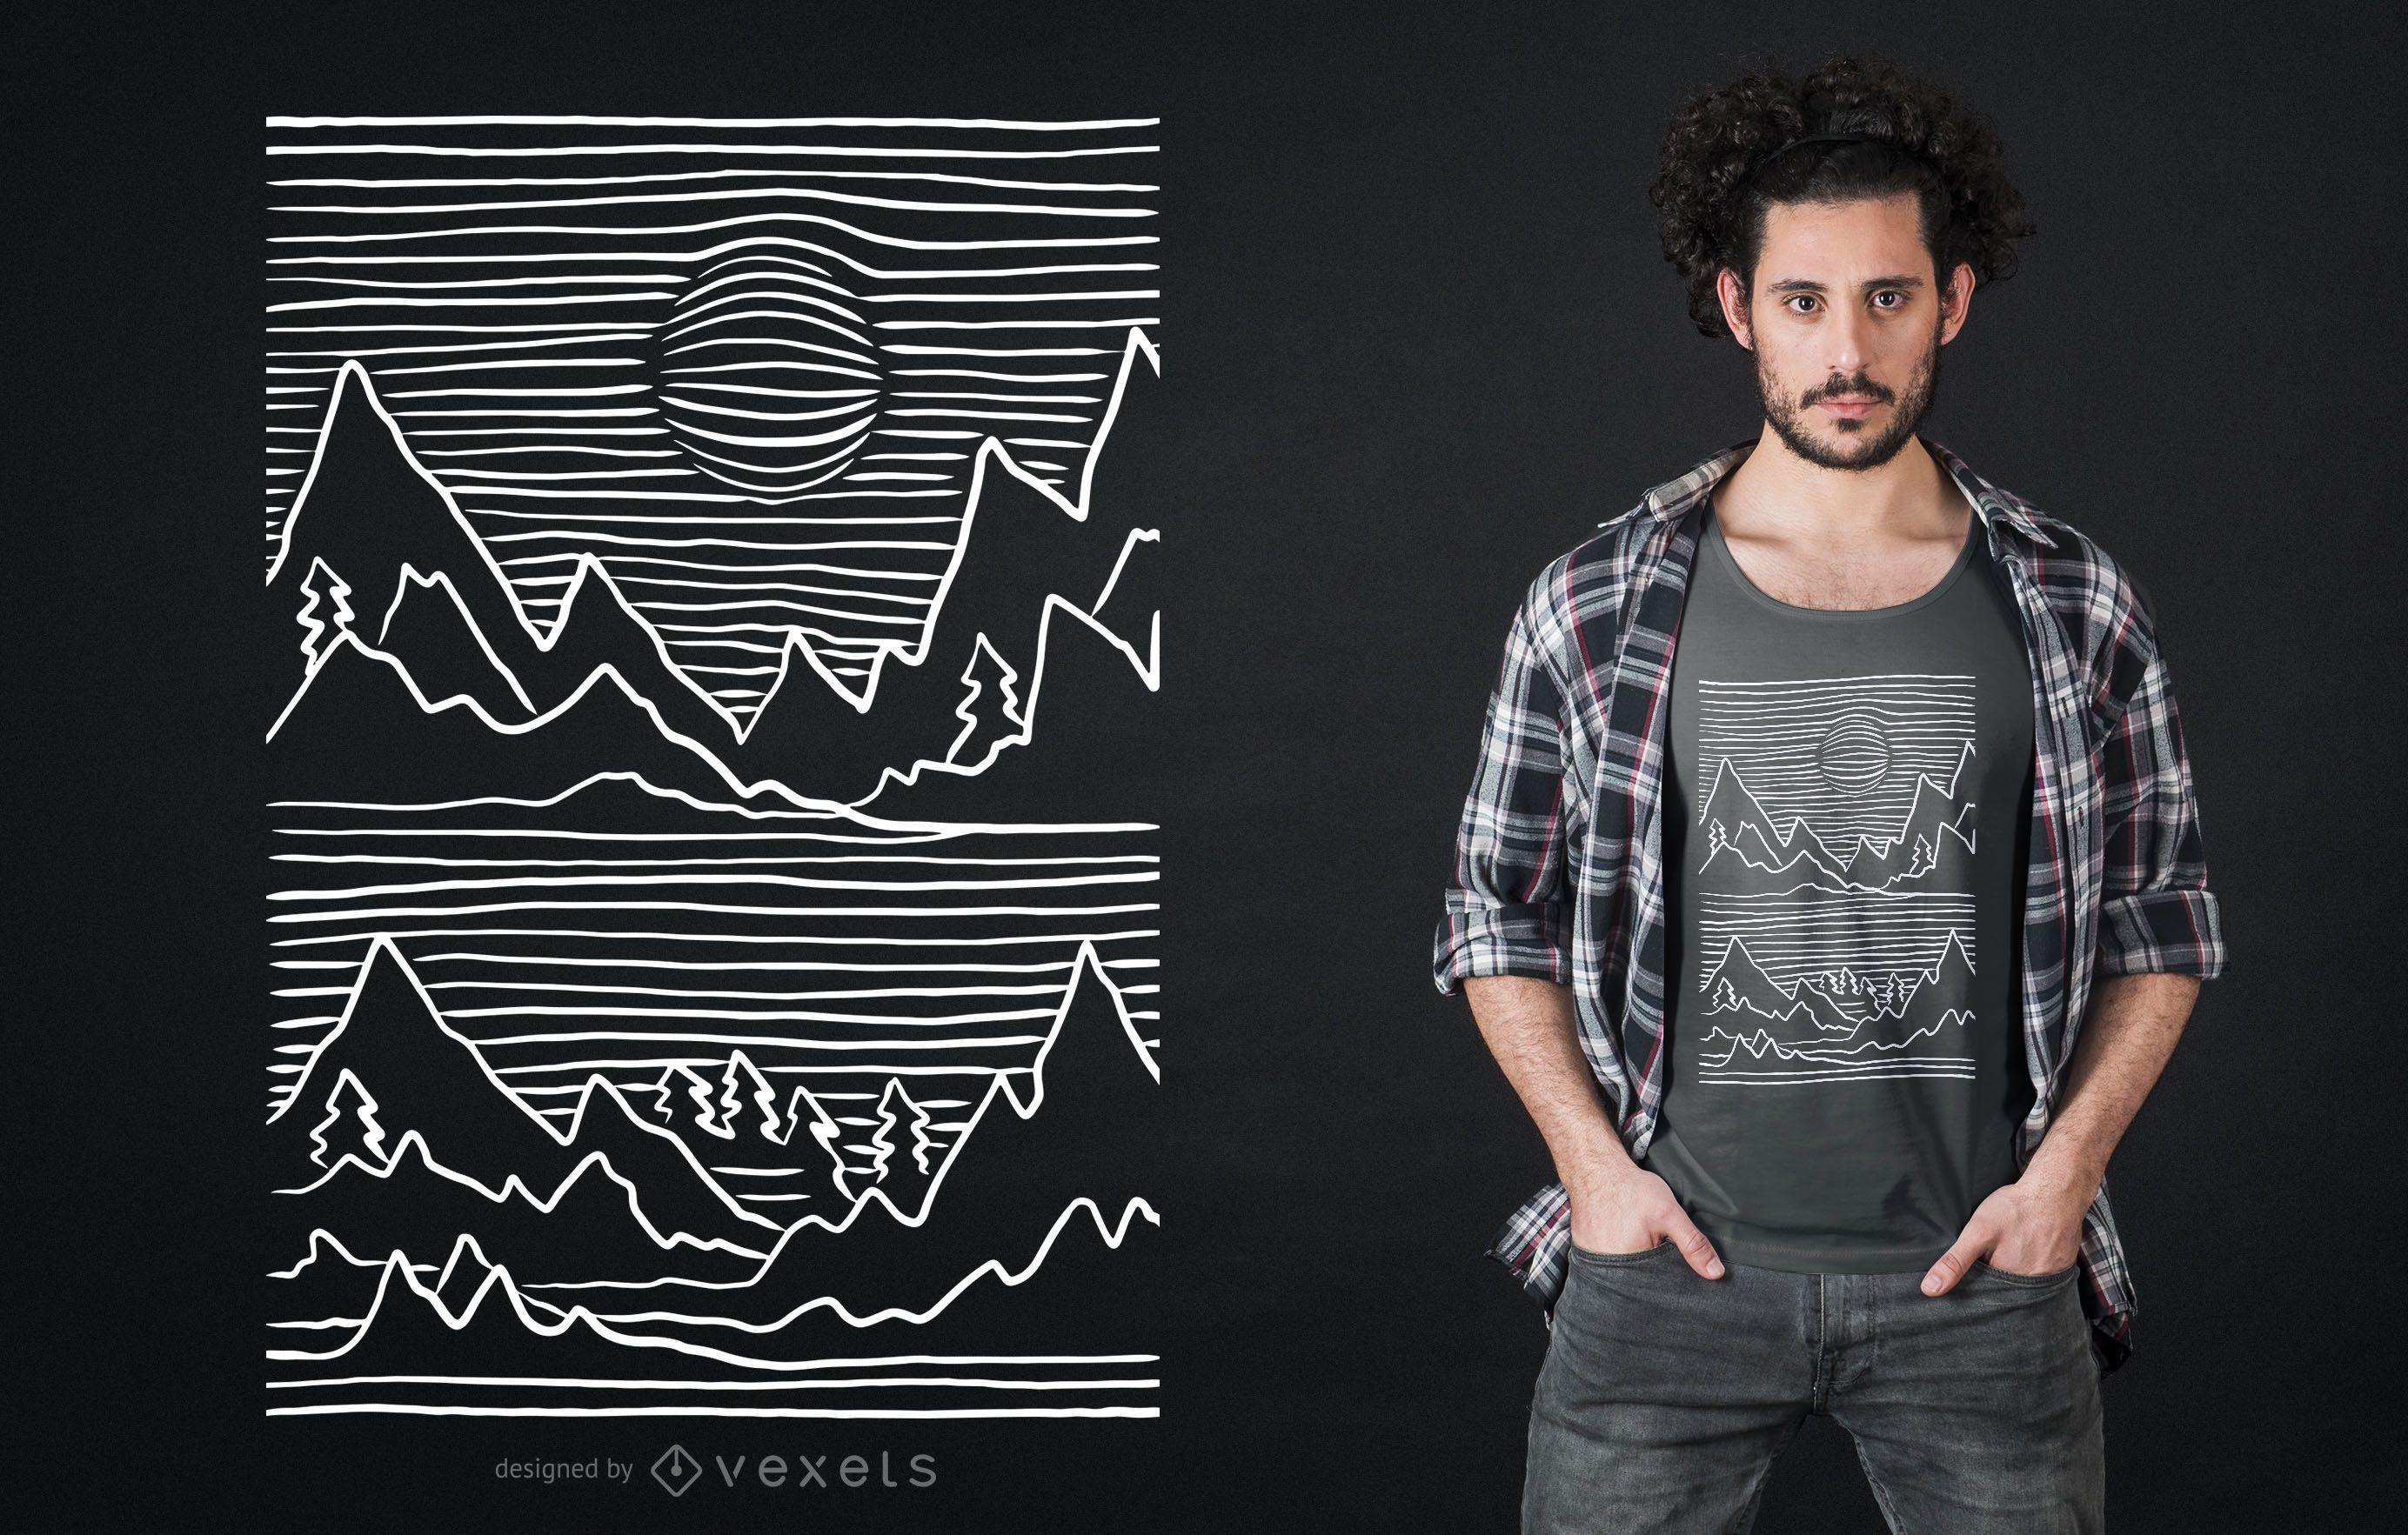 3D Mountain Stroke T-shirt Design